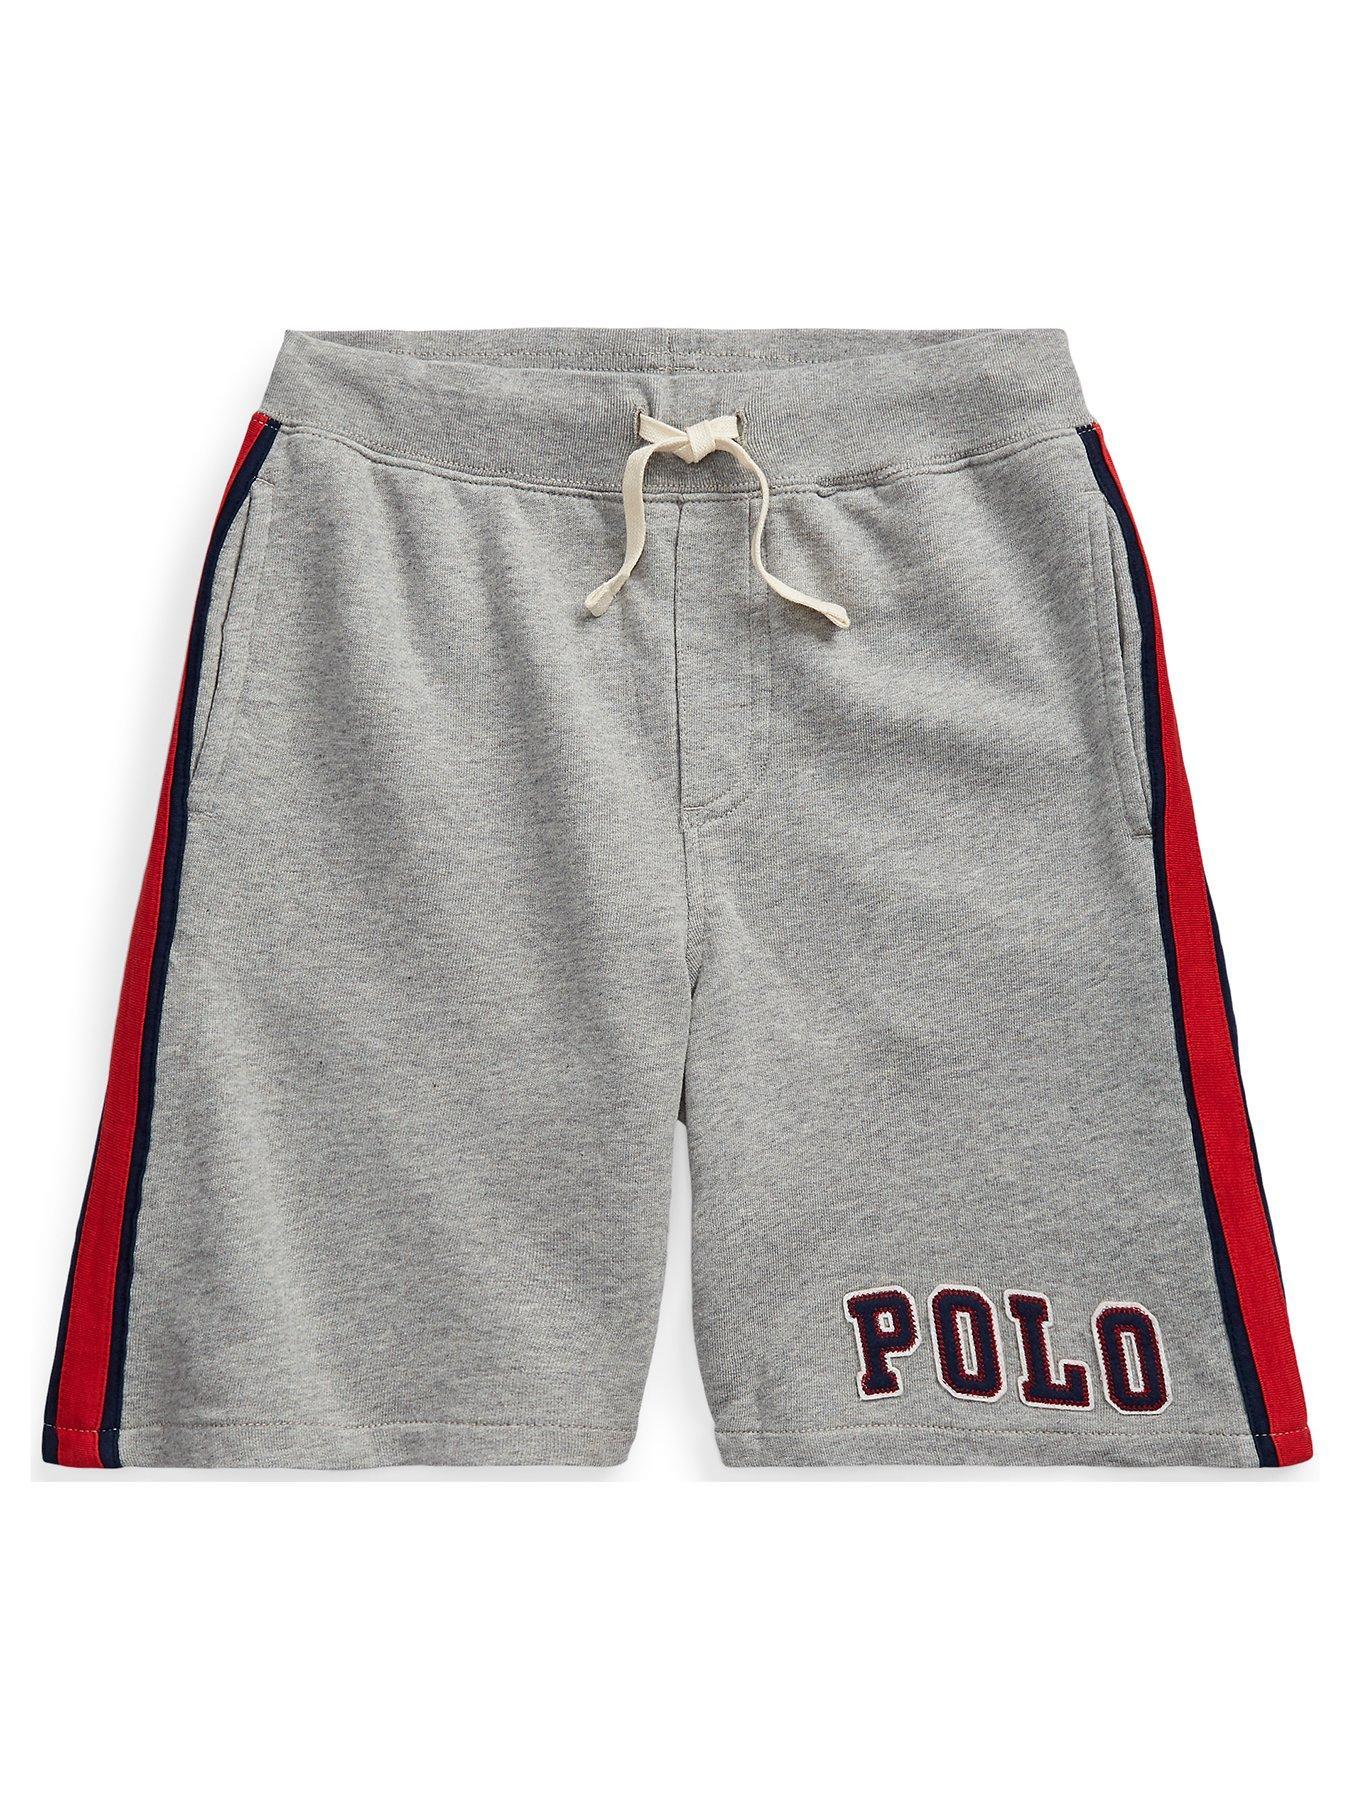 New Ralph Lauren Sport Women Multi Pony Mini Shorts 2 6 8